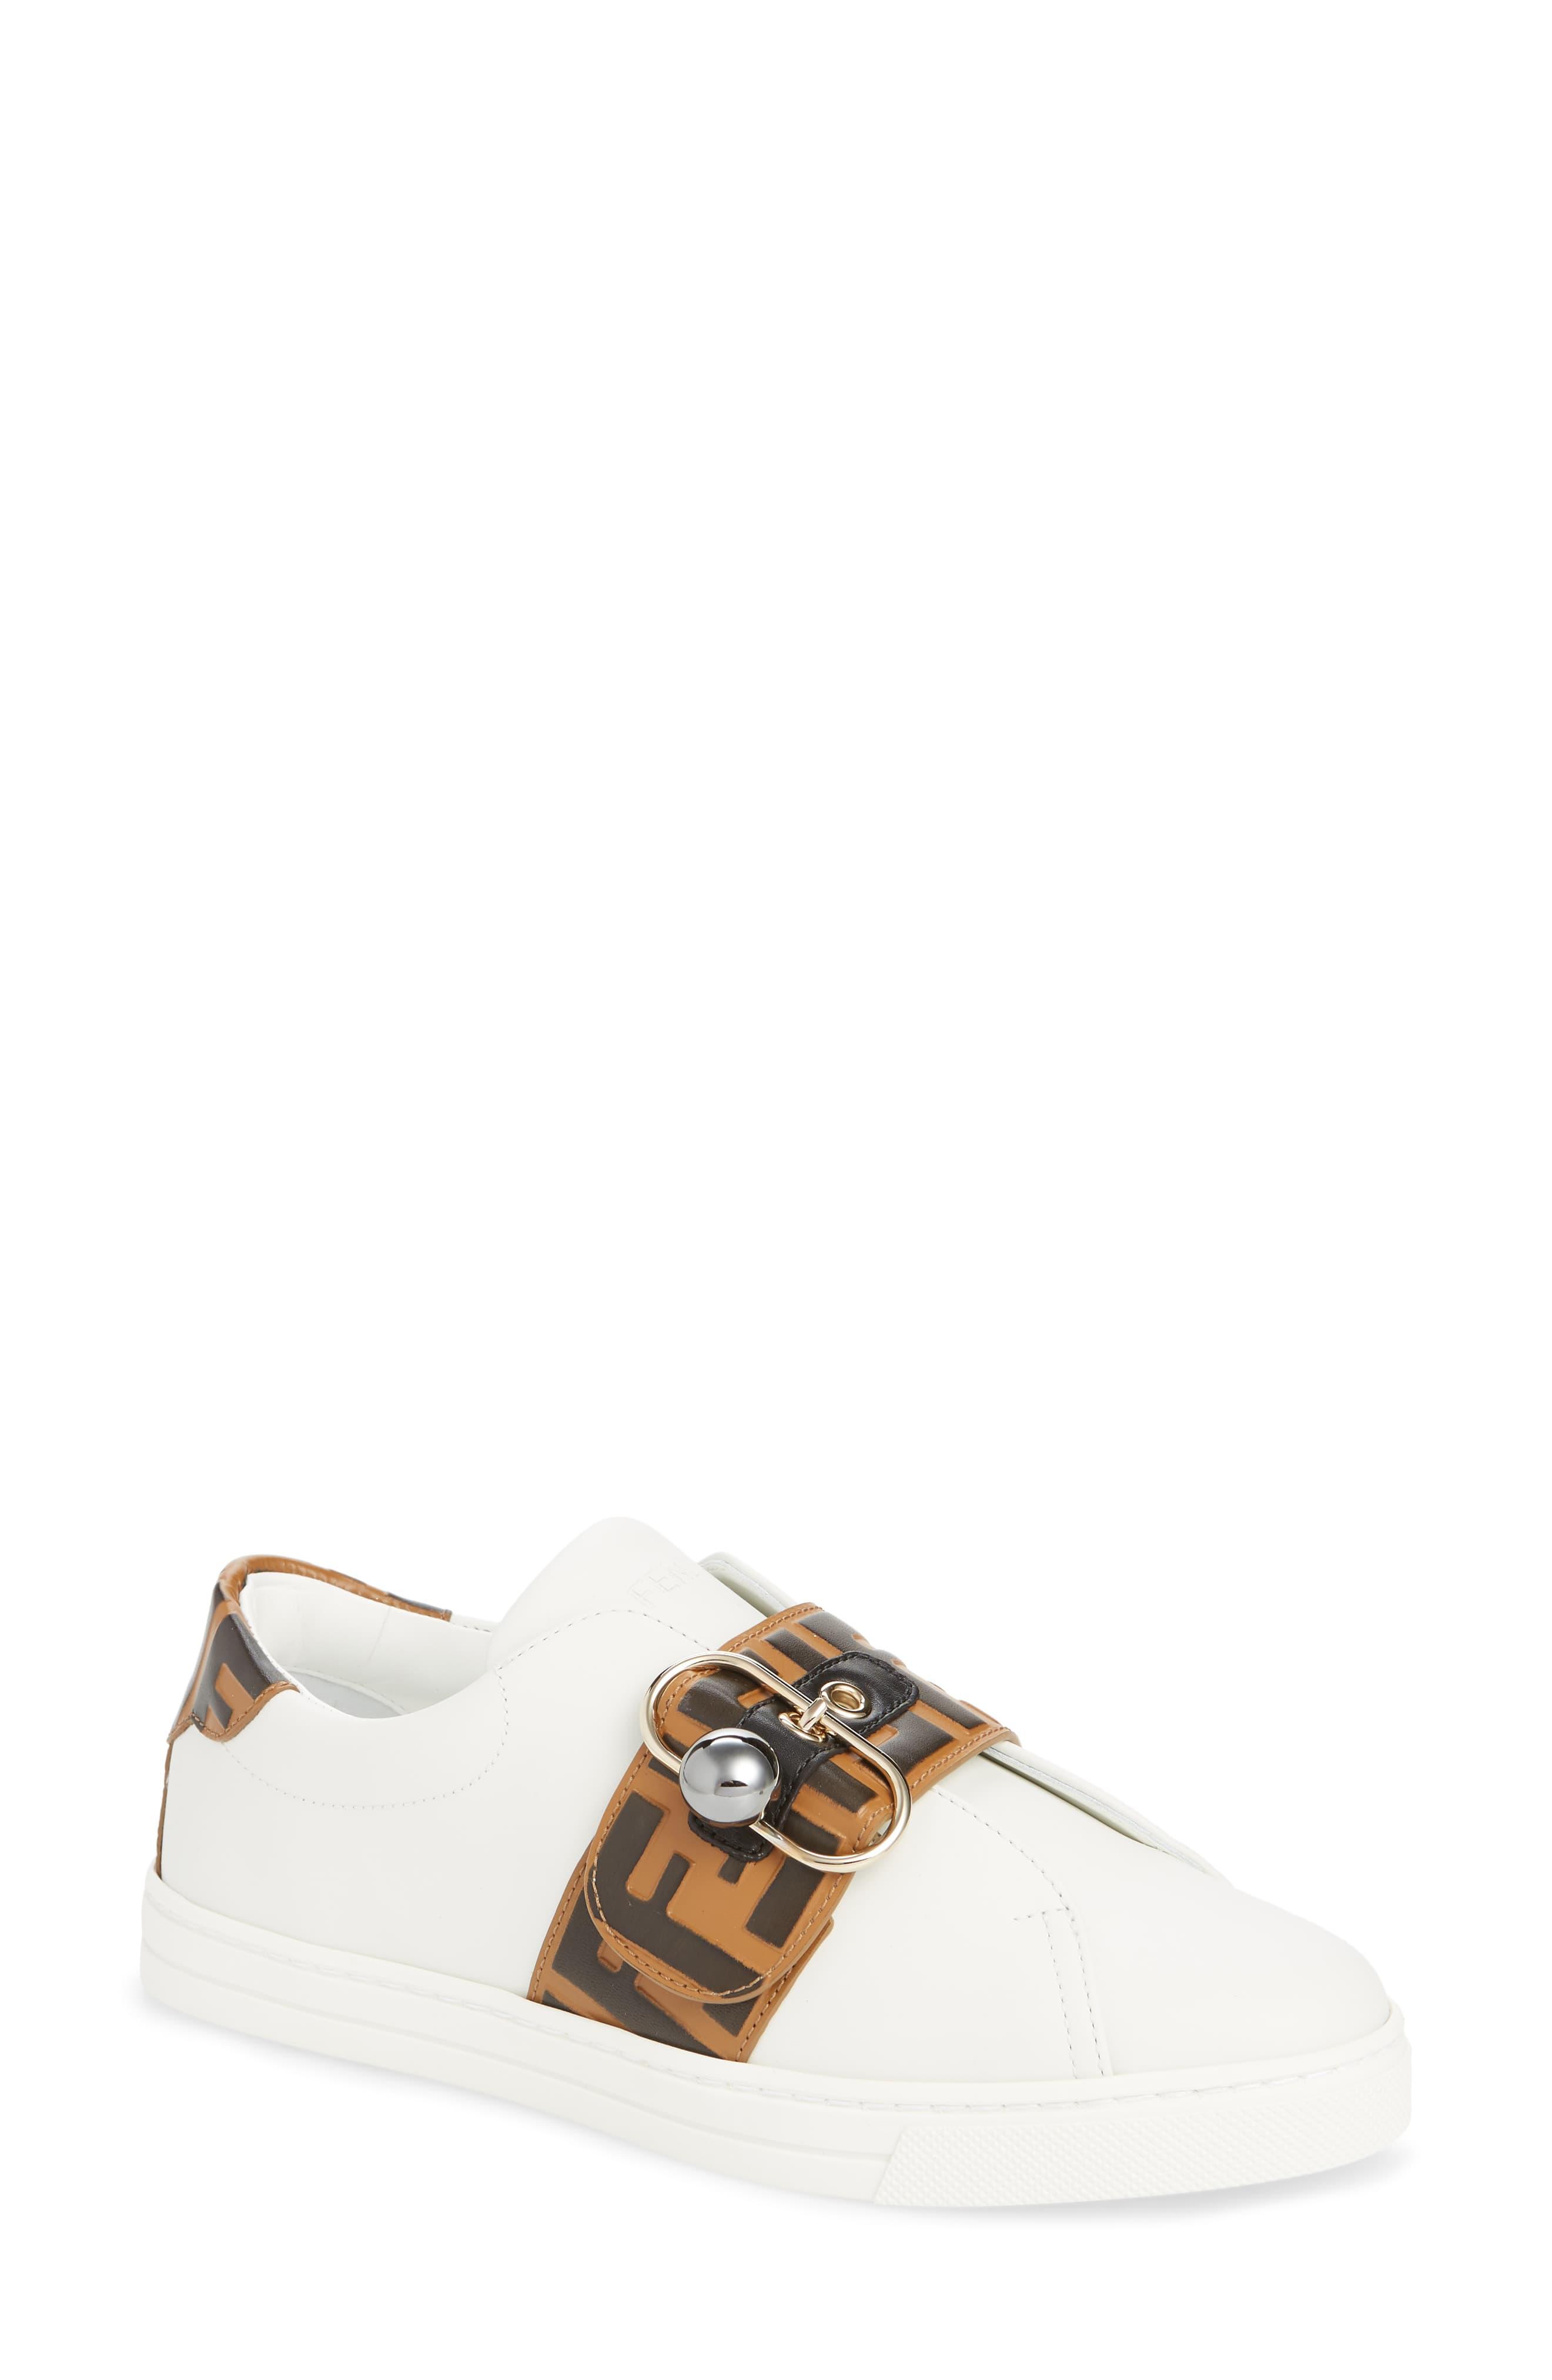 Fendi Pearland Logo Slip-On Sneaker